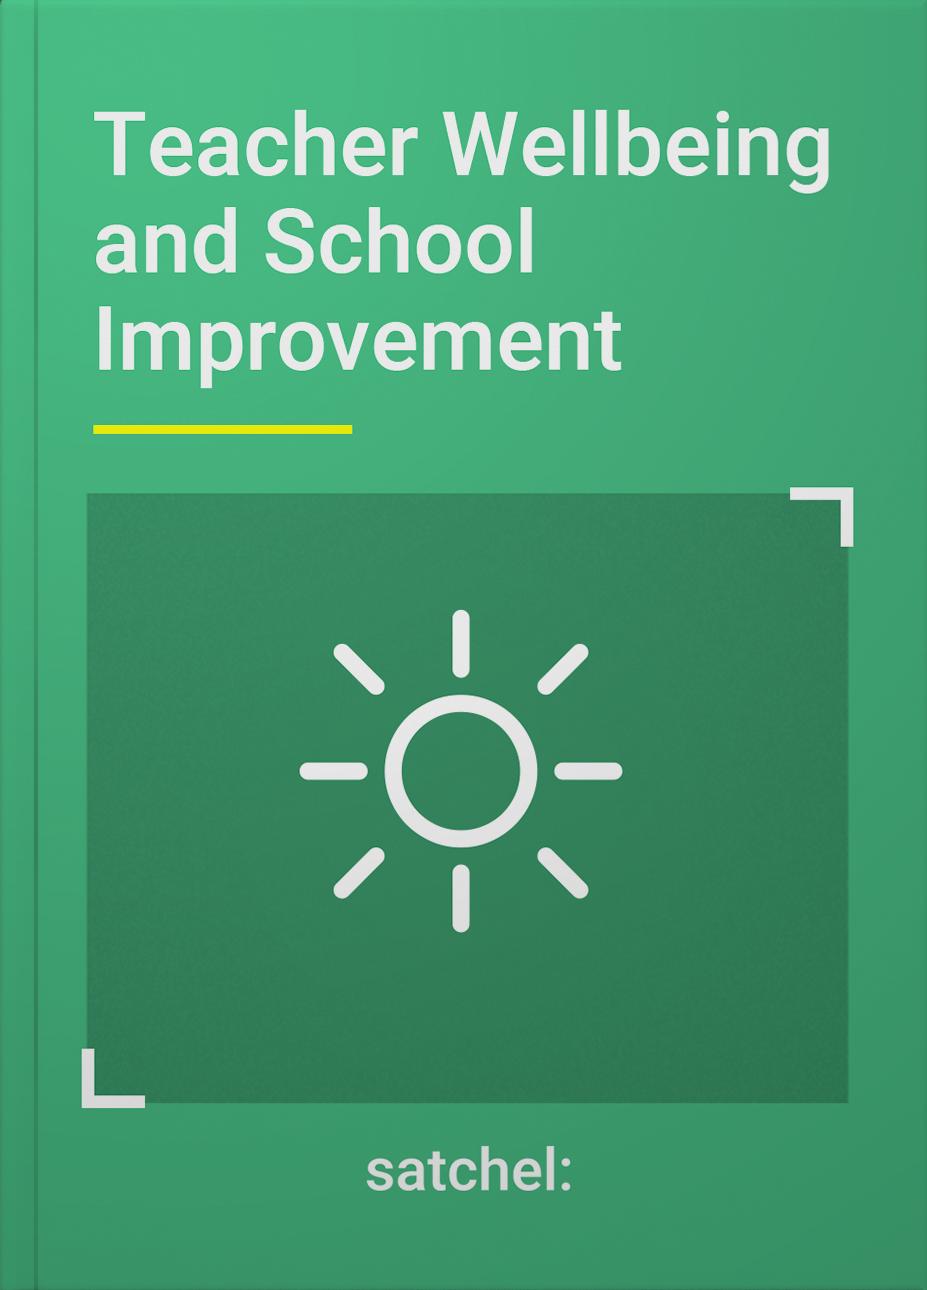 Satchel Guide Teacher Wellbeing and School Improvement